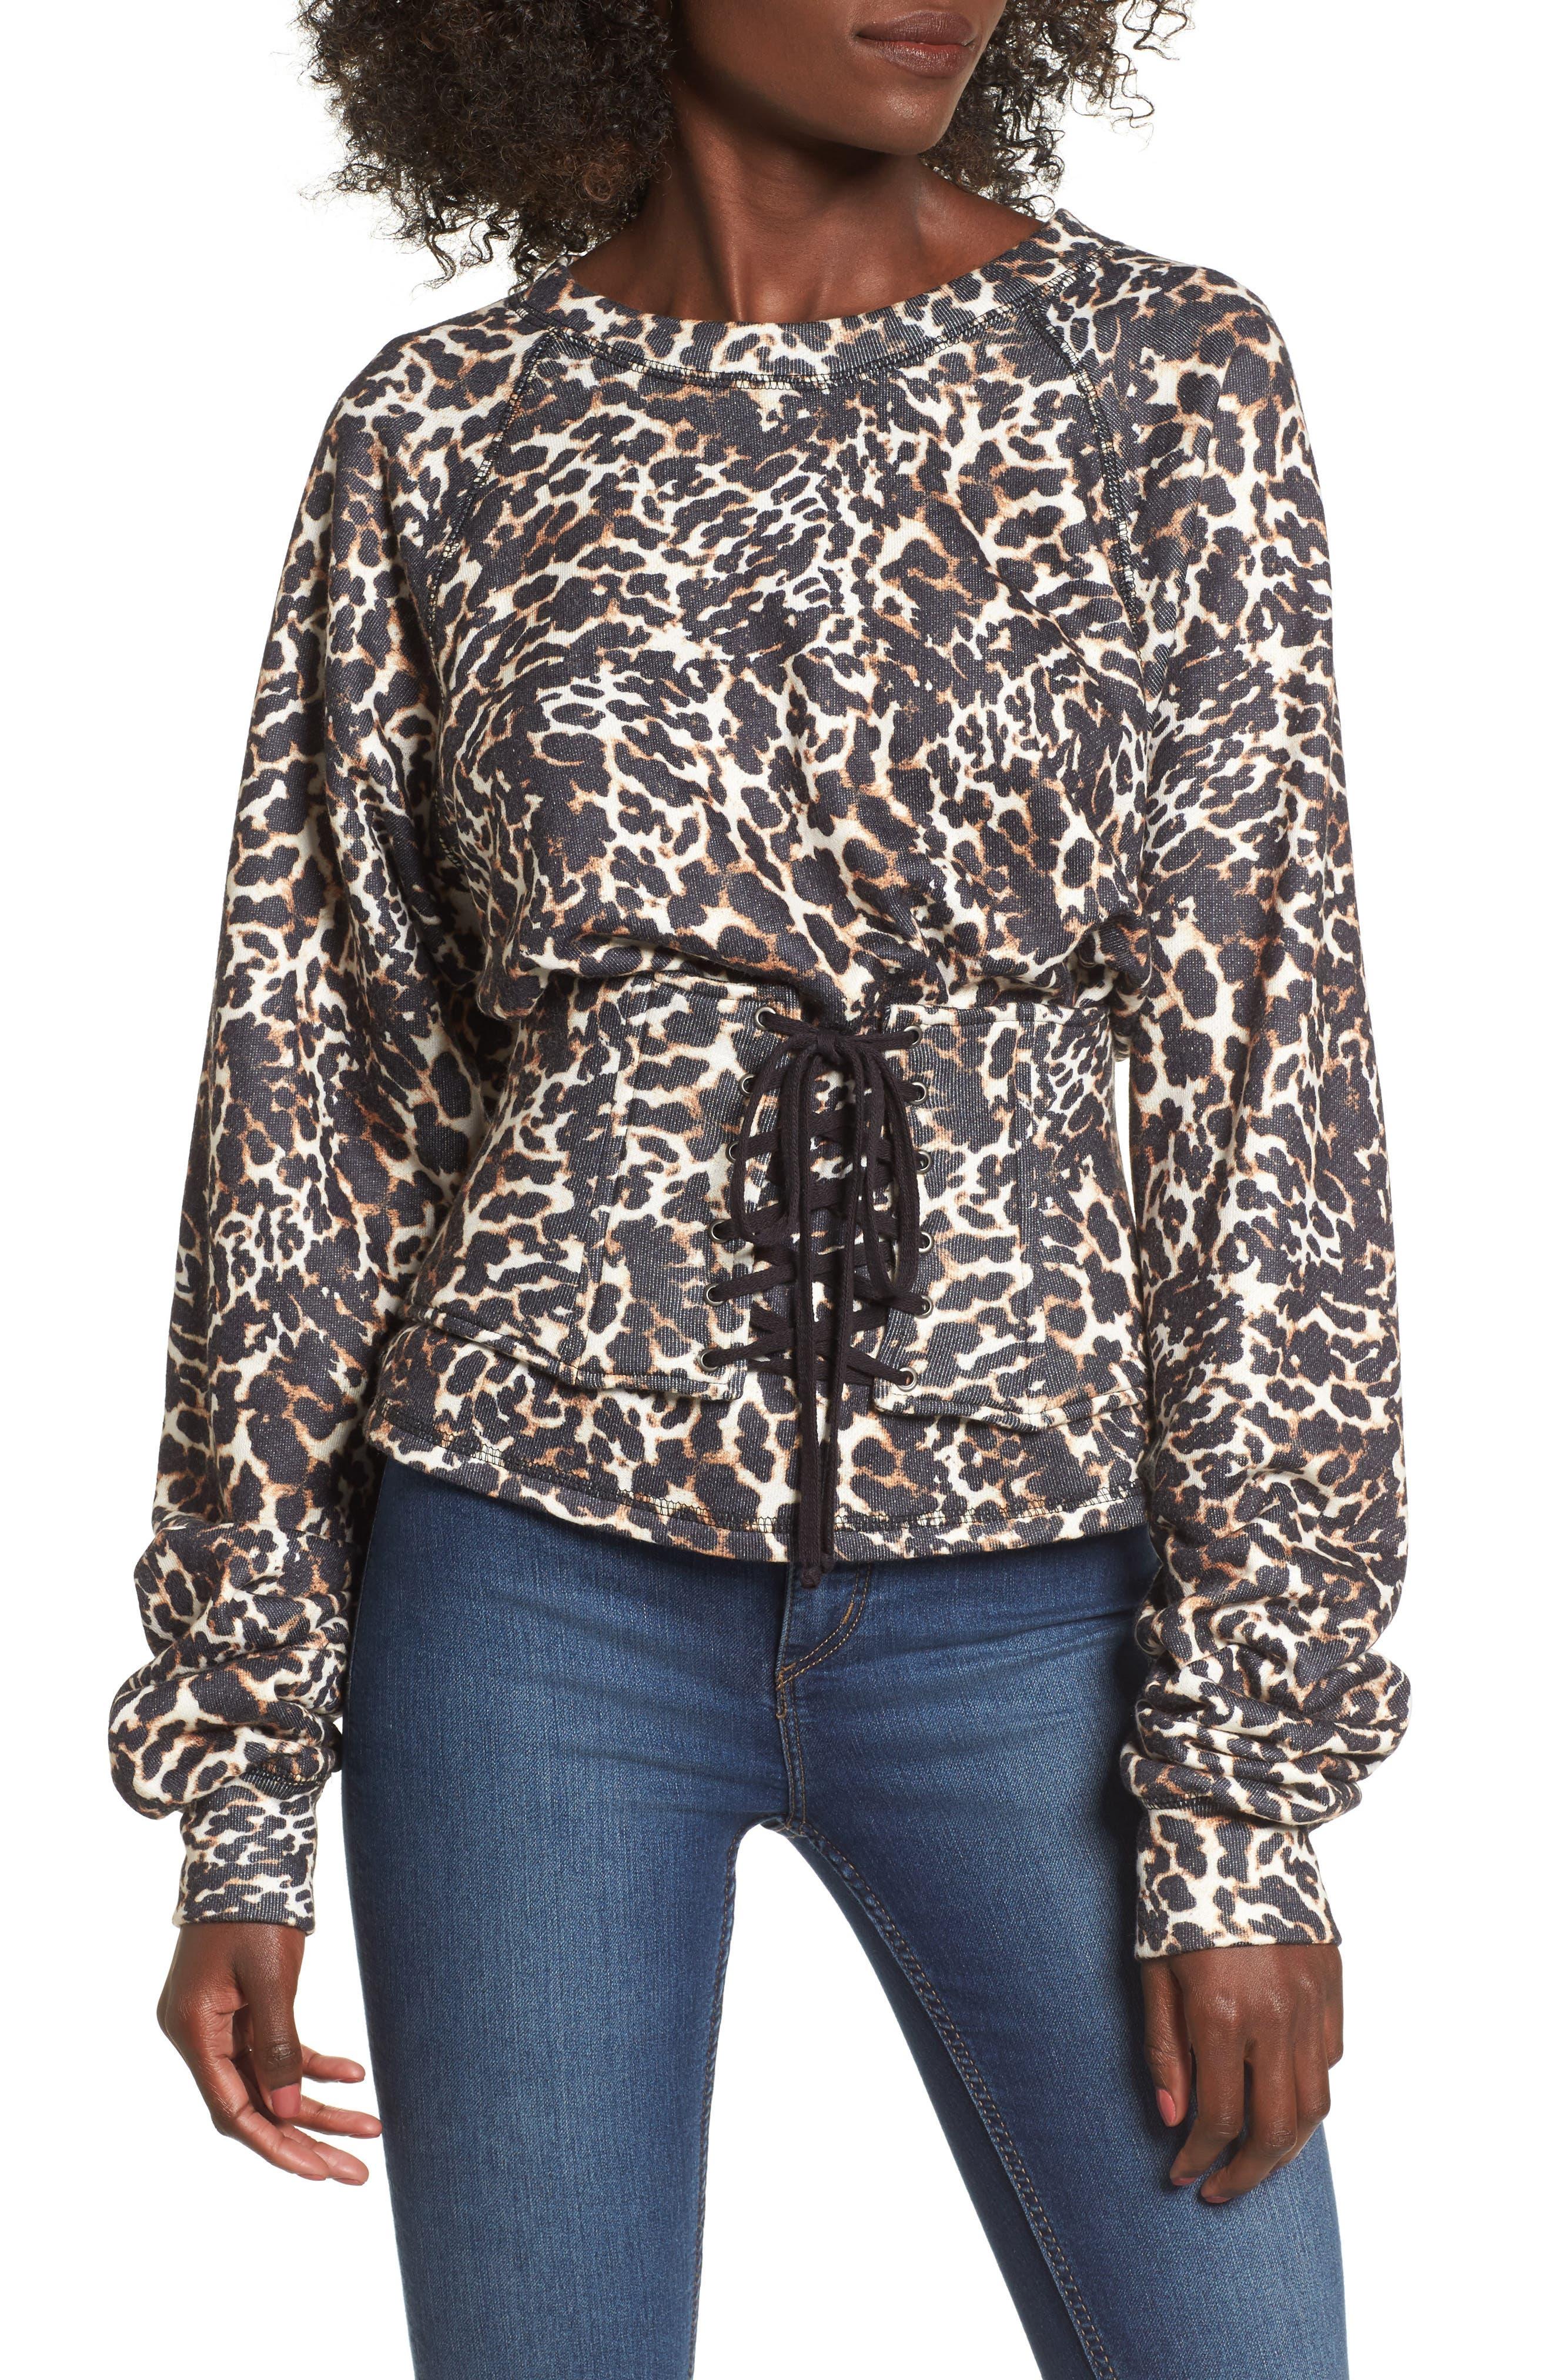 Alternate Image 1 Selected - AFRM Mason Corset Sweatshirt